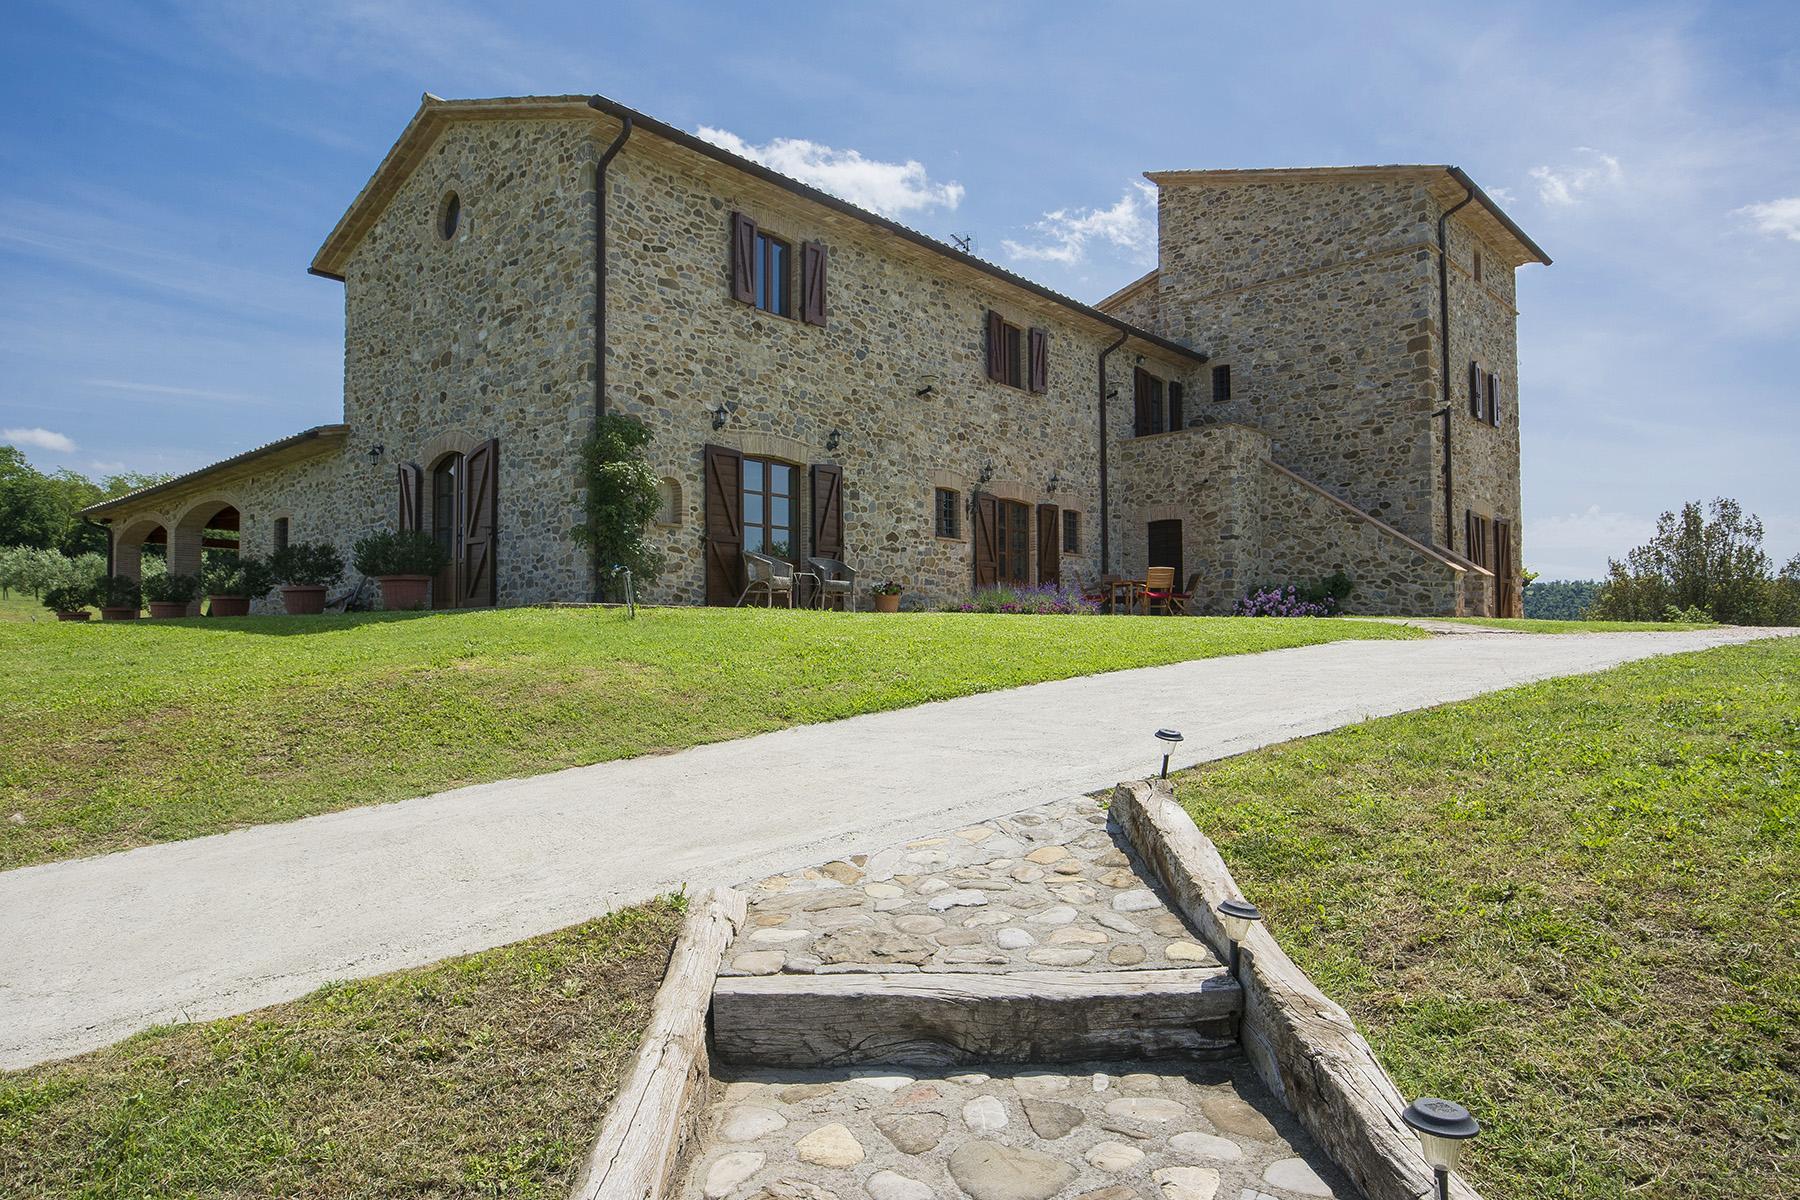 Eccezionale proprietà tra Toscana e Umbria - 2